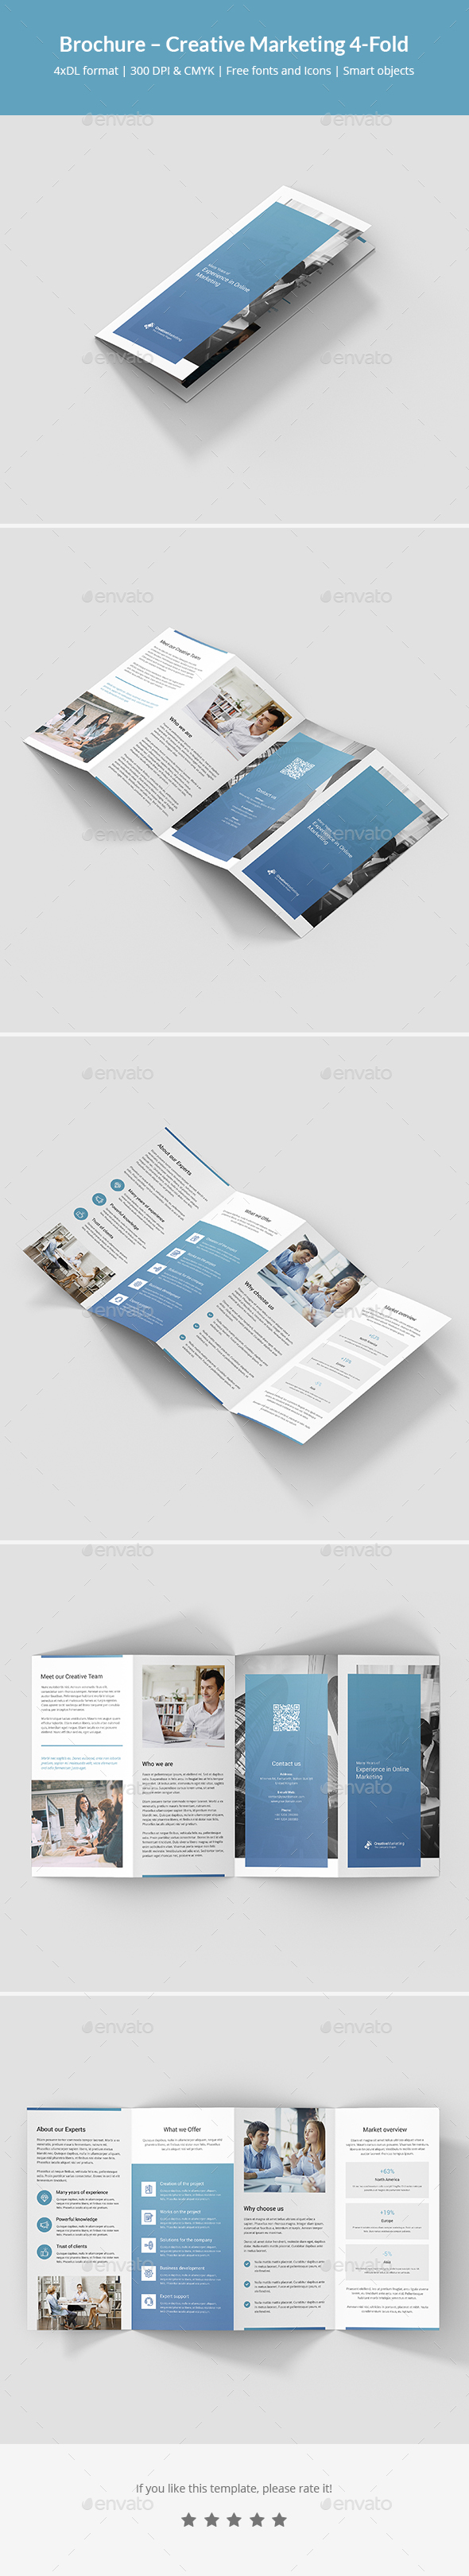 Brochure – Creative Marketing 4-Fold - Corporate Brochures